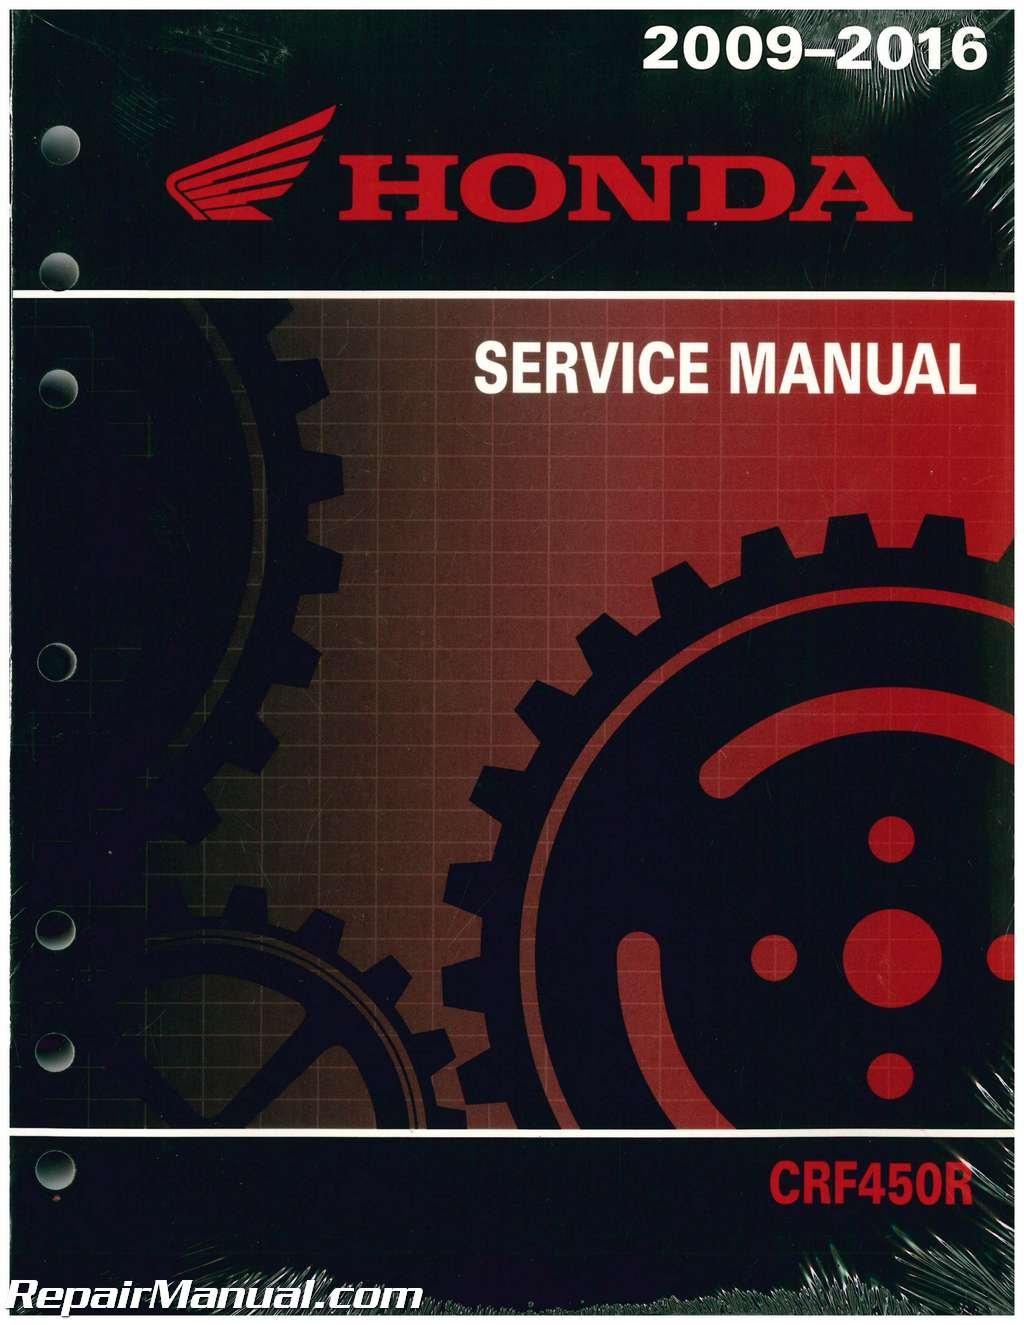 61MEN75 2009-2014 Honda CRF450R Motorcycle Service Manual: Manufacturer:  Amazon.com: Books